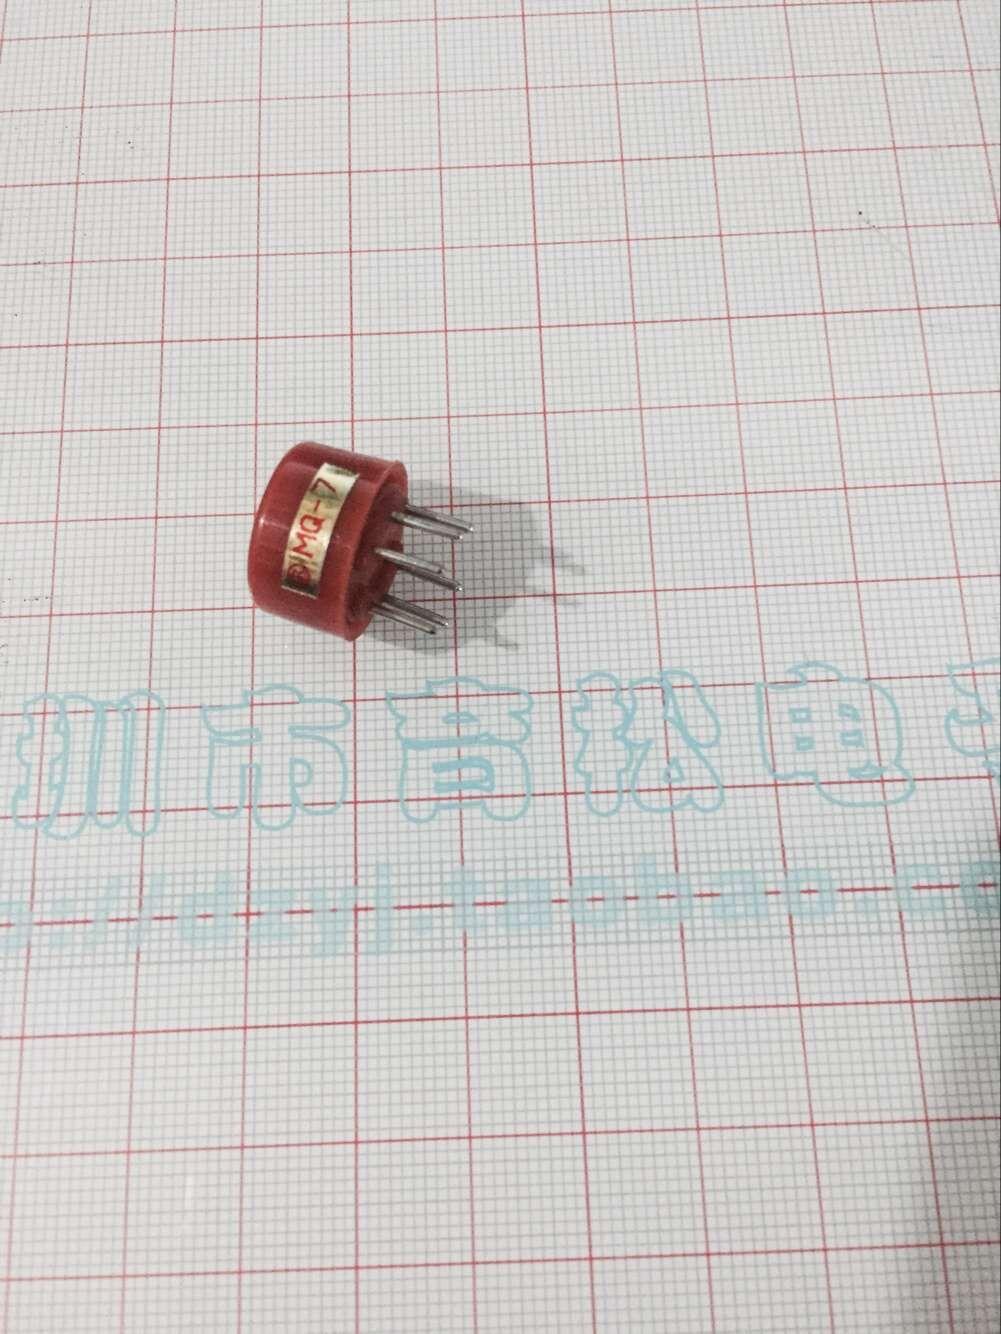 MQ MQ7 carbon monoxide sensor semiconductor gas sensitive element The semiconductor carbon monoxide gas sensor(China (Mainland))